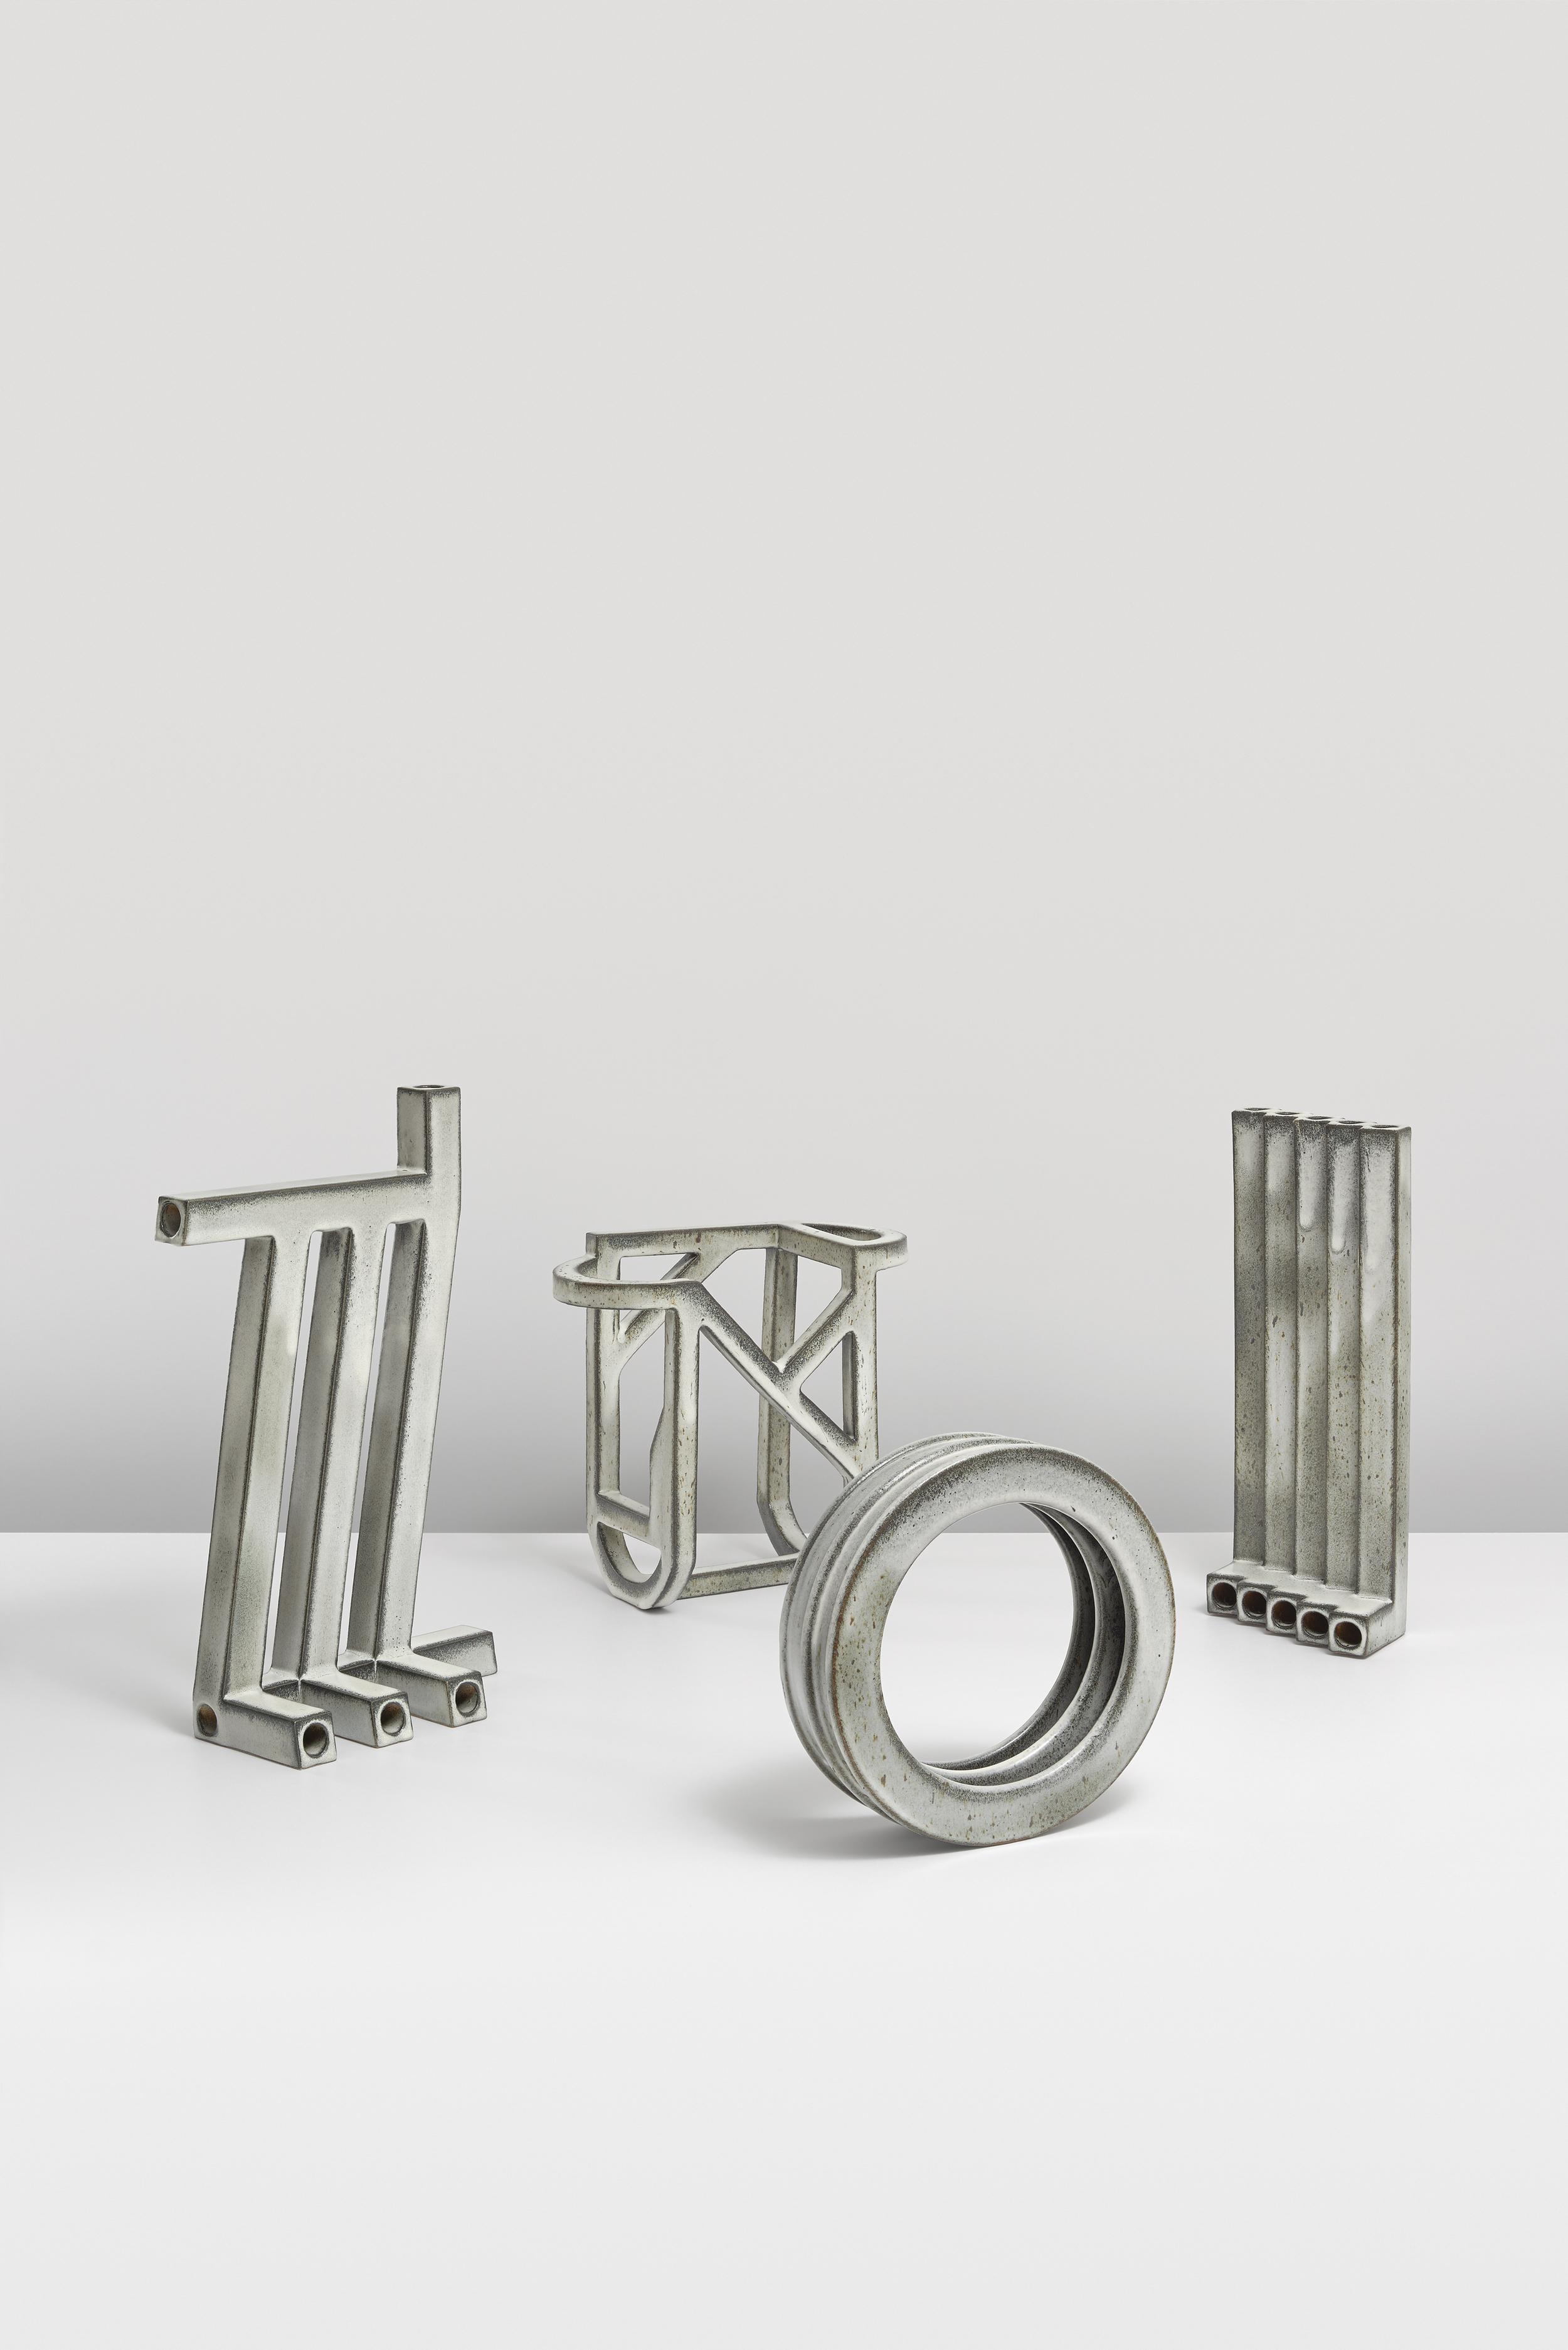 Ian McDonald_Studio Objects 14_15_1.jpg